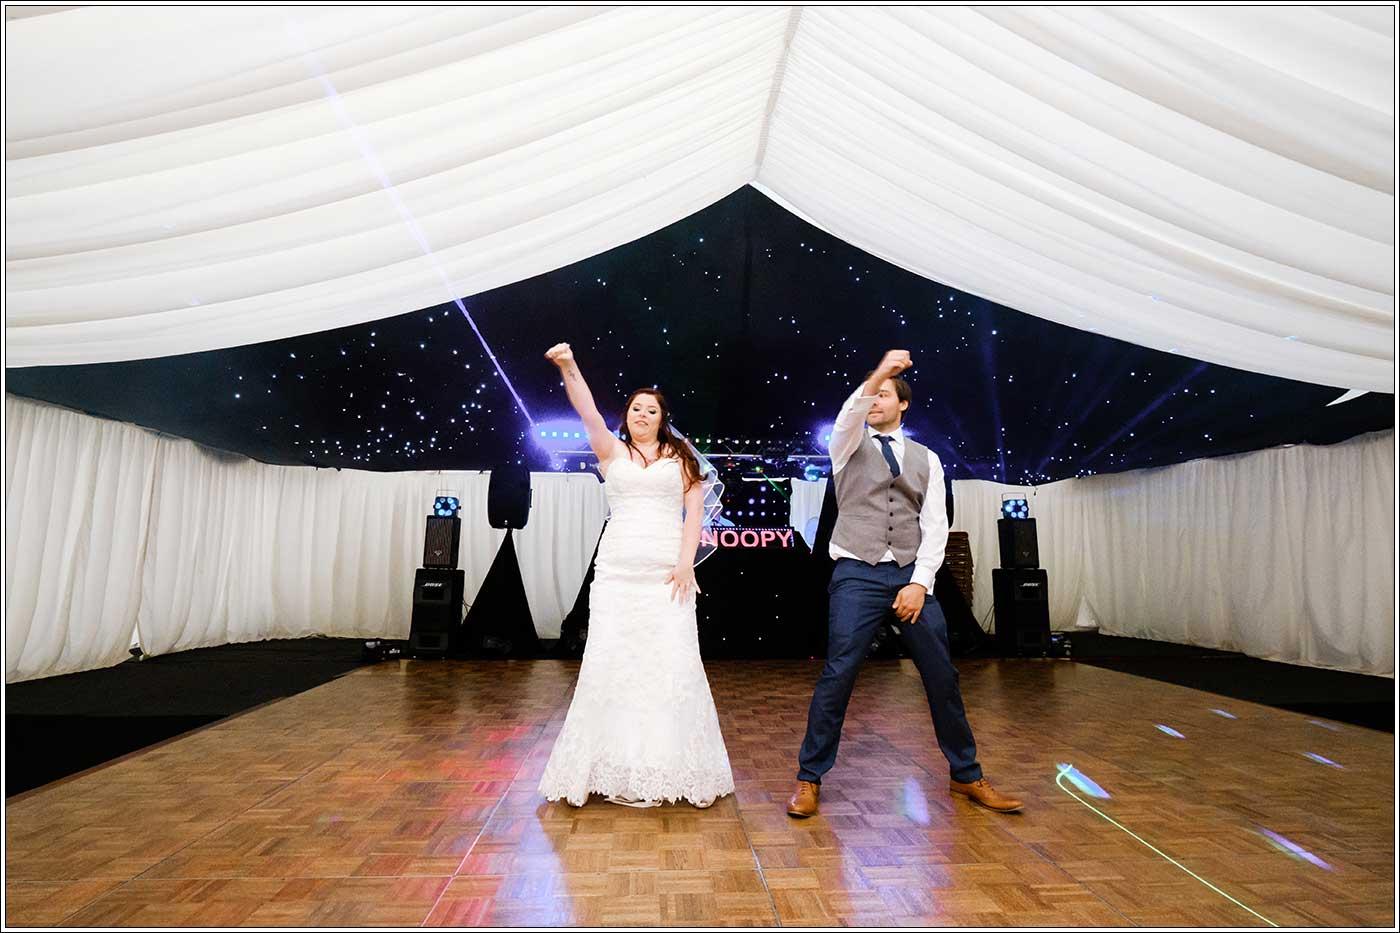 Groom and bride's first dance during their Park Hall Farm wedding by documentary wedding photographer Birmingham Clive Blair Pphotography